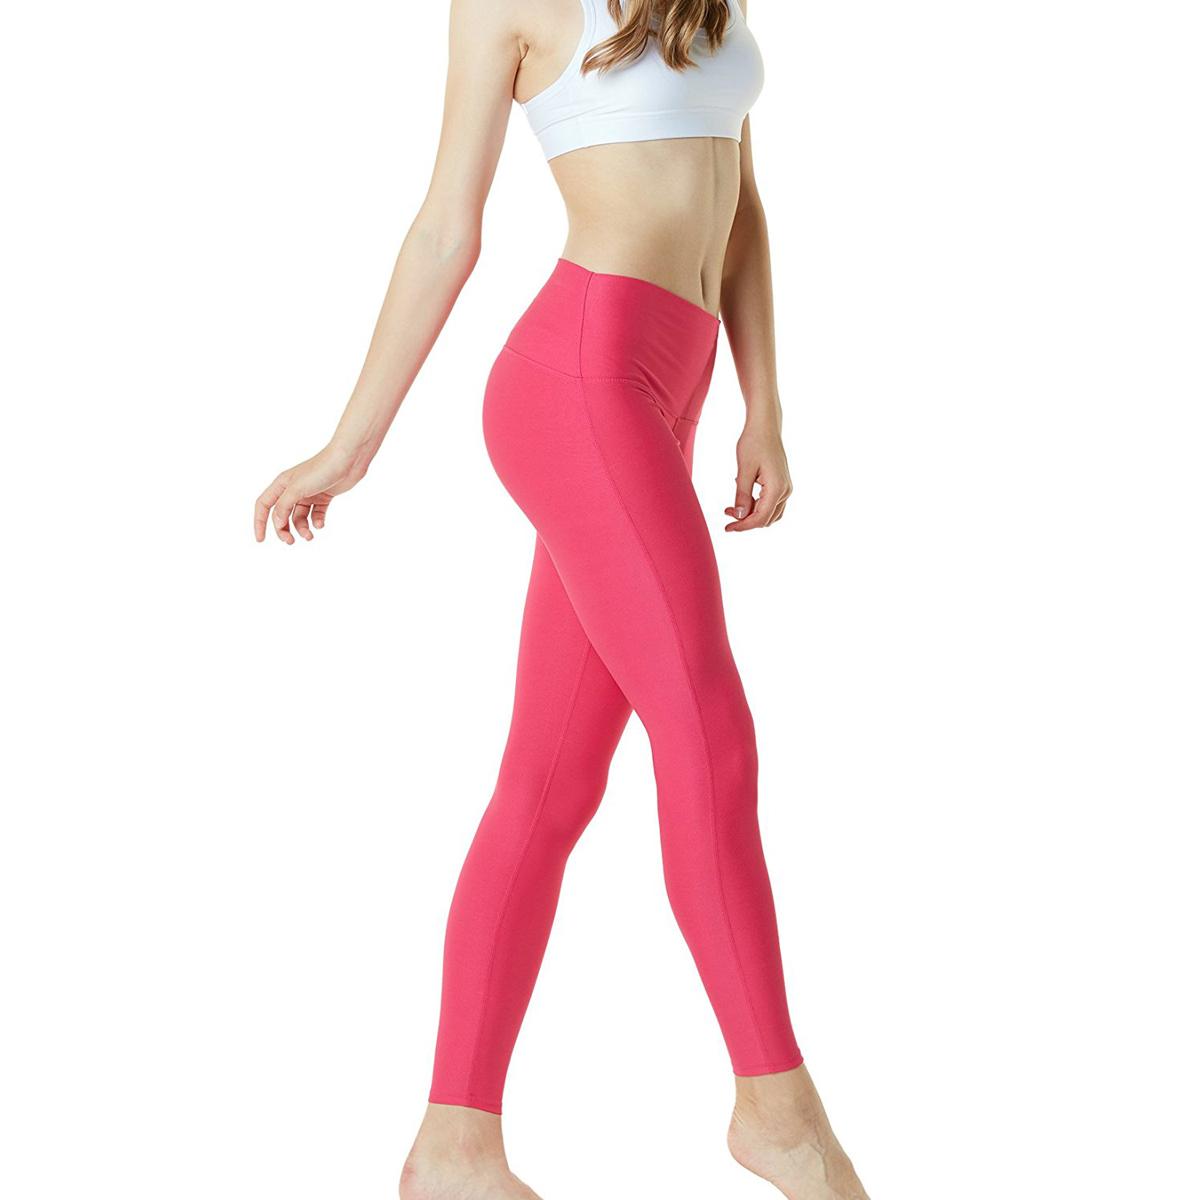 thumbnail 39 - TSLA Tesla FYP42 Women's High-Waisted Ultra-Stretch Tummy Control Yoga Pants